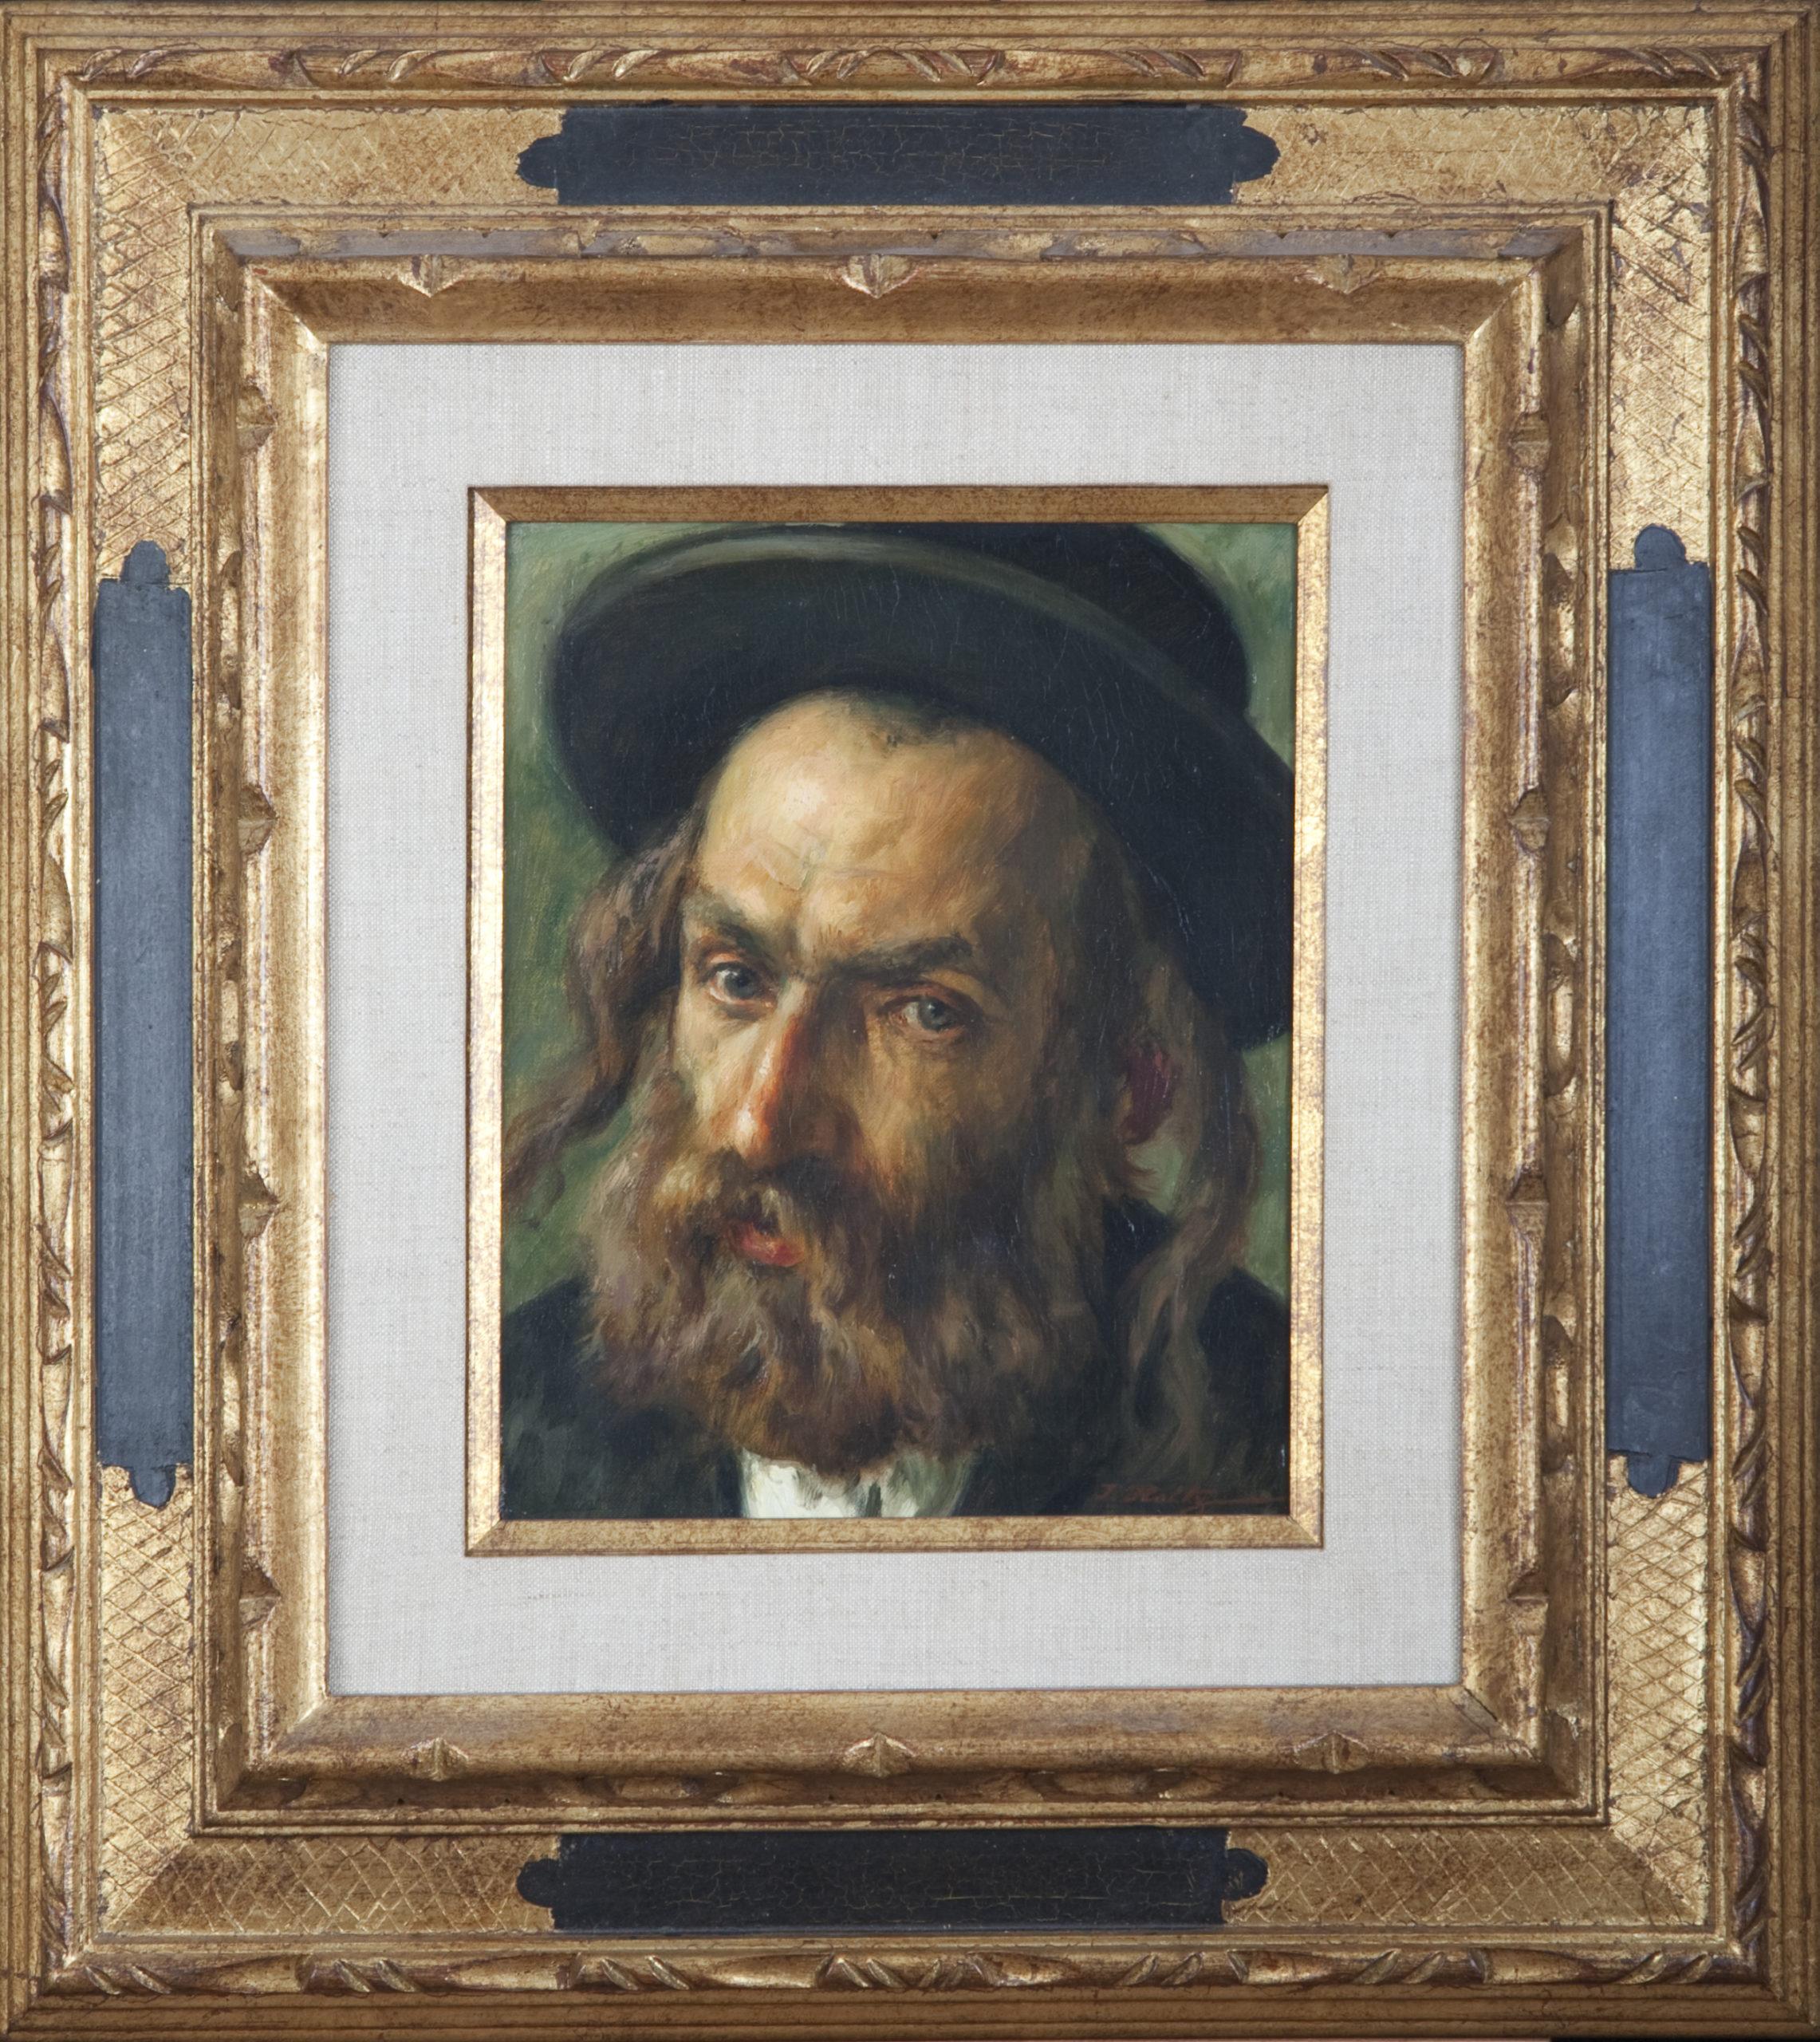 071 Yossel 1968 - Oil on Canvas - 8 x 10 - Frame: 18 x 20 x 2